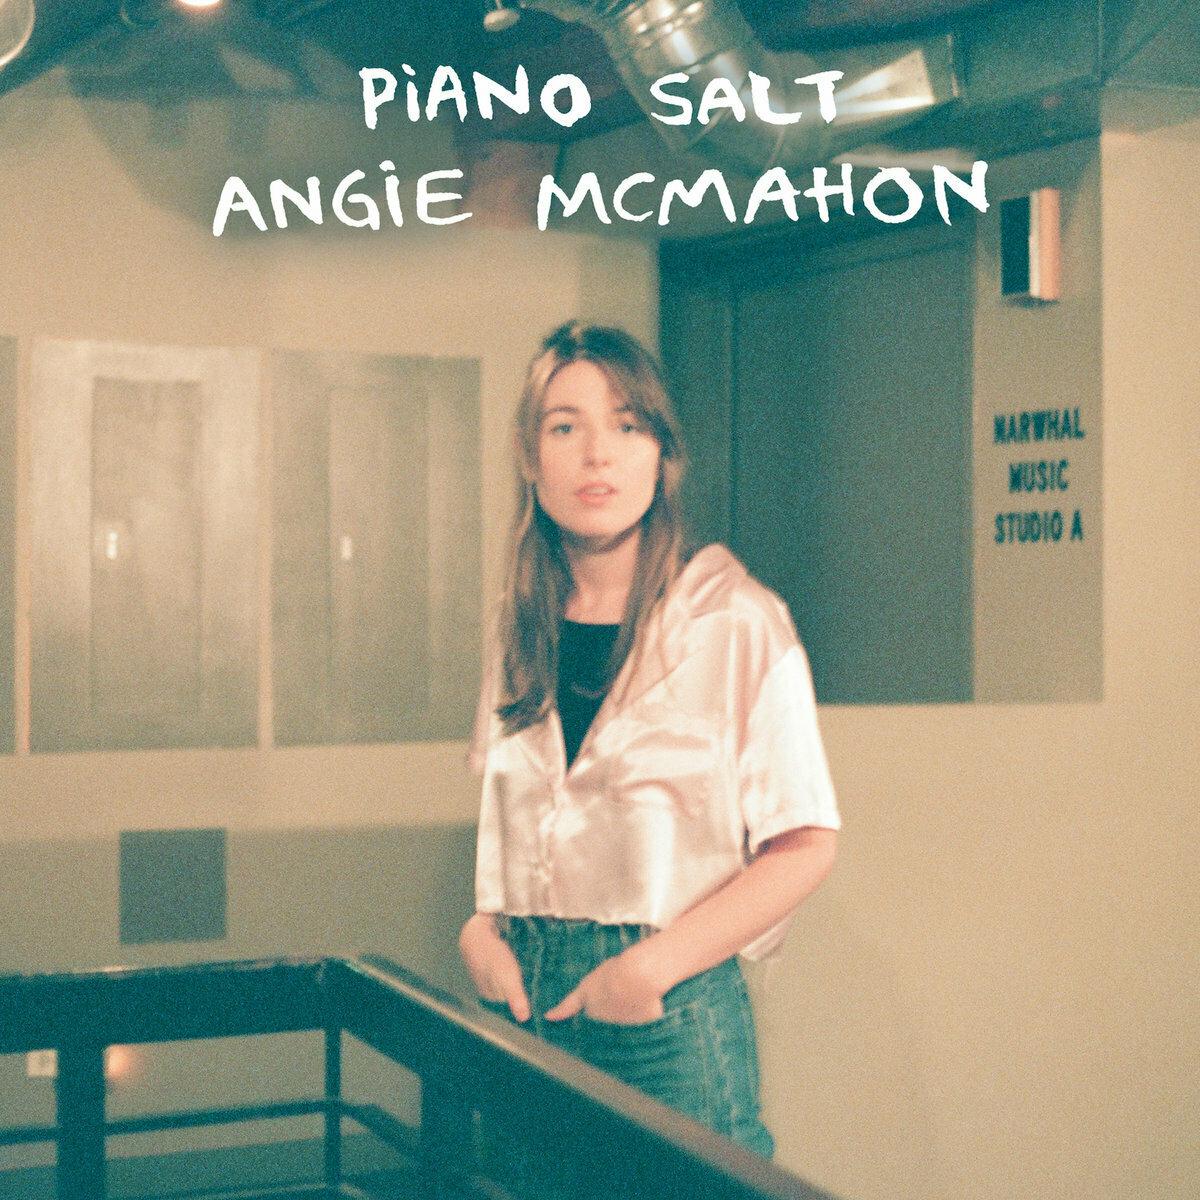 Angie McMahon - Piano Salt [LP]